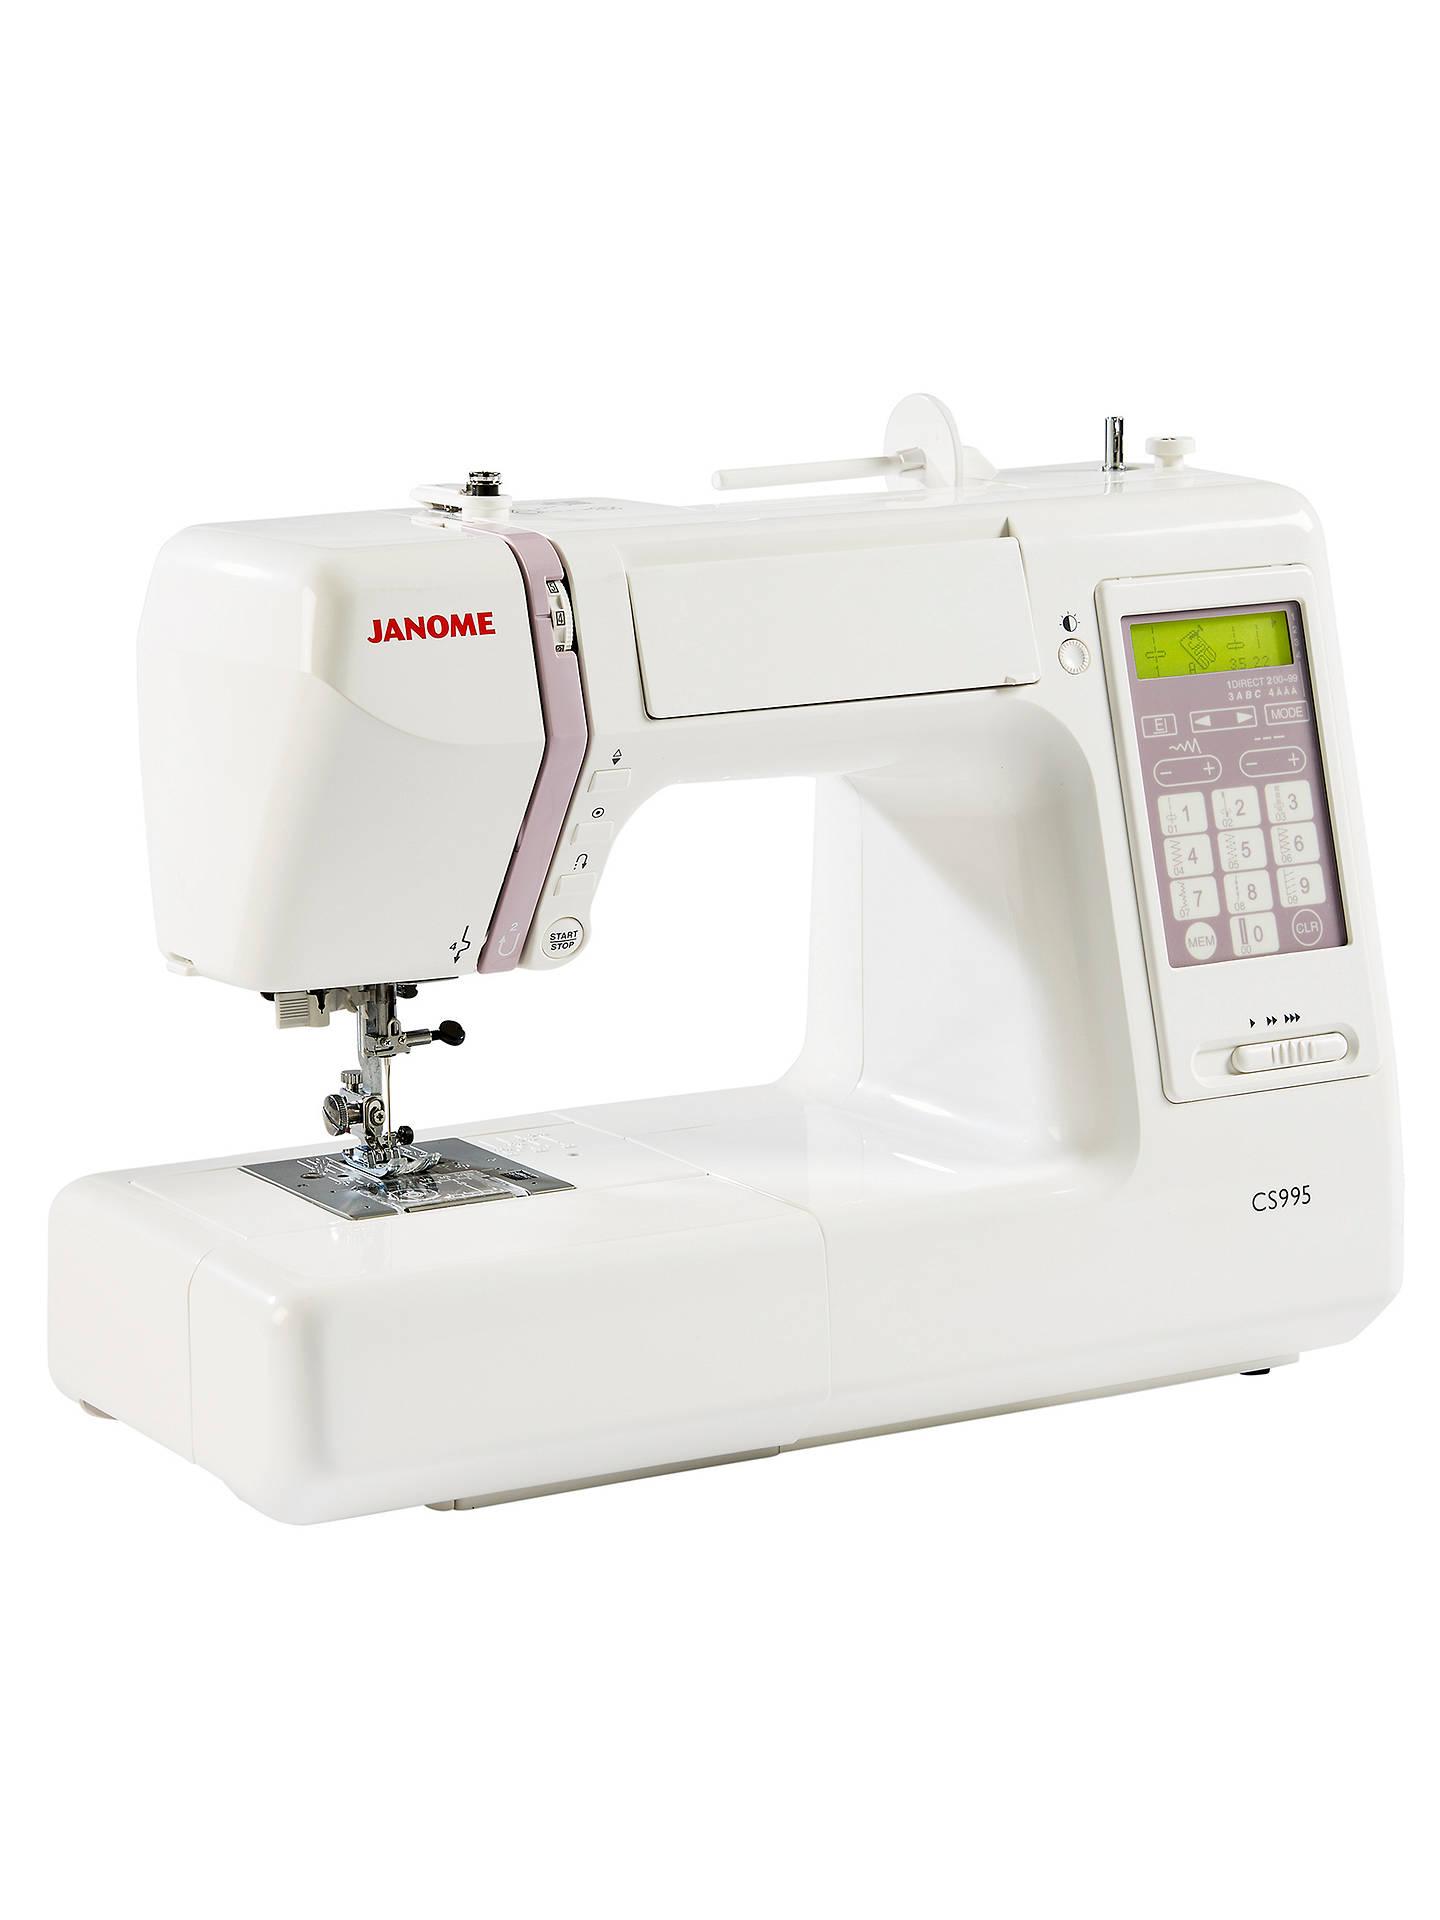 Janome CS995 Computerised Sewing Machine, White at John ...